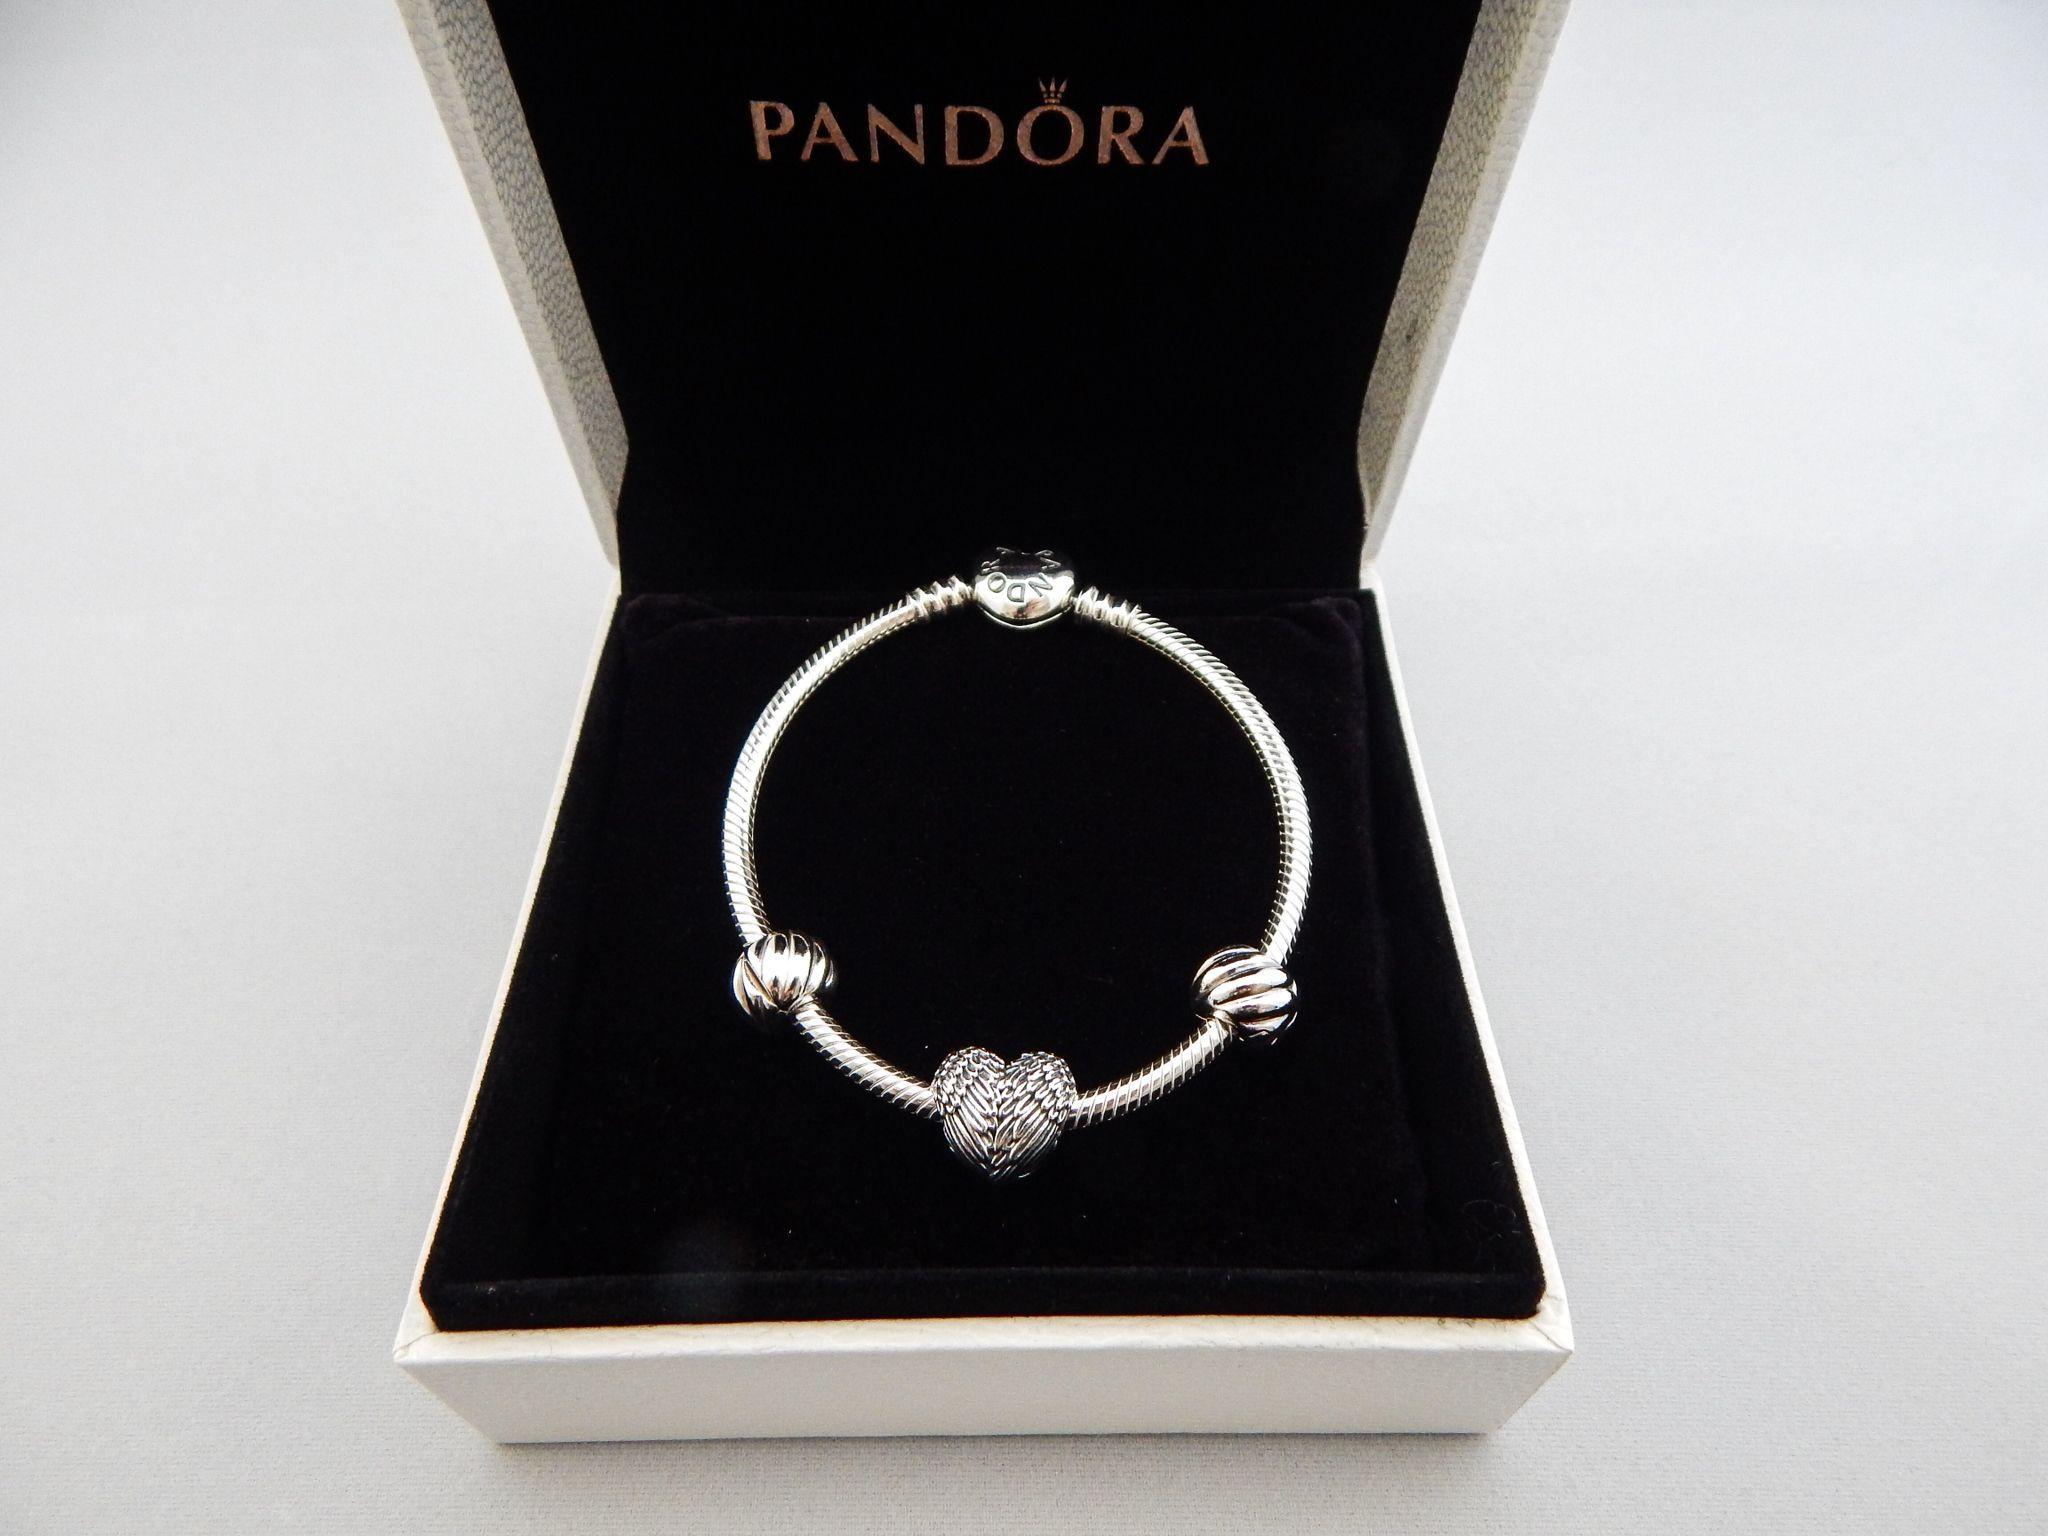 f330d1547 Pandora Jewelry 60% OFF! >>>Visit>> The heart clasp Pandora bracelet ...